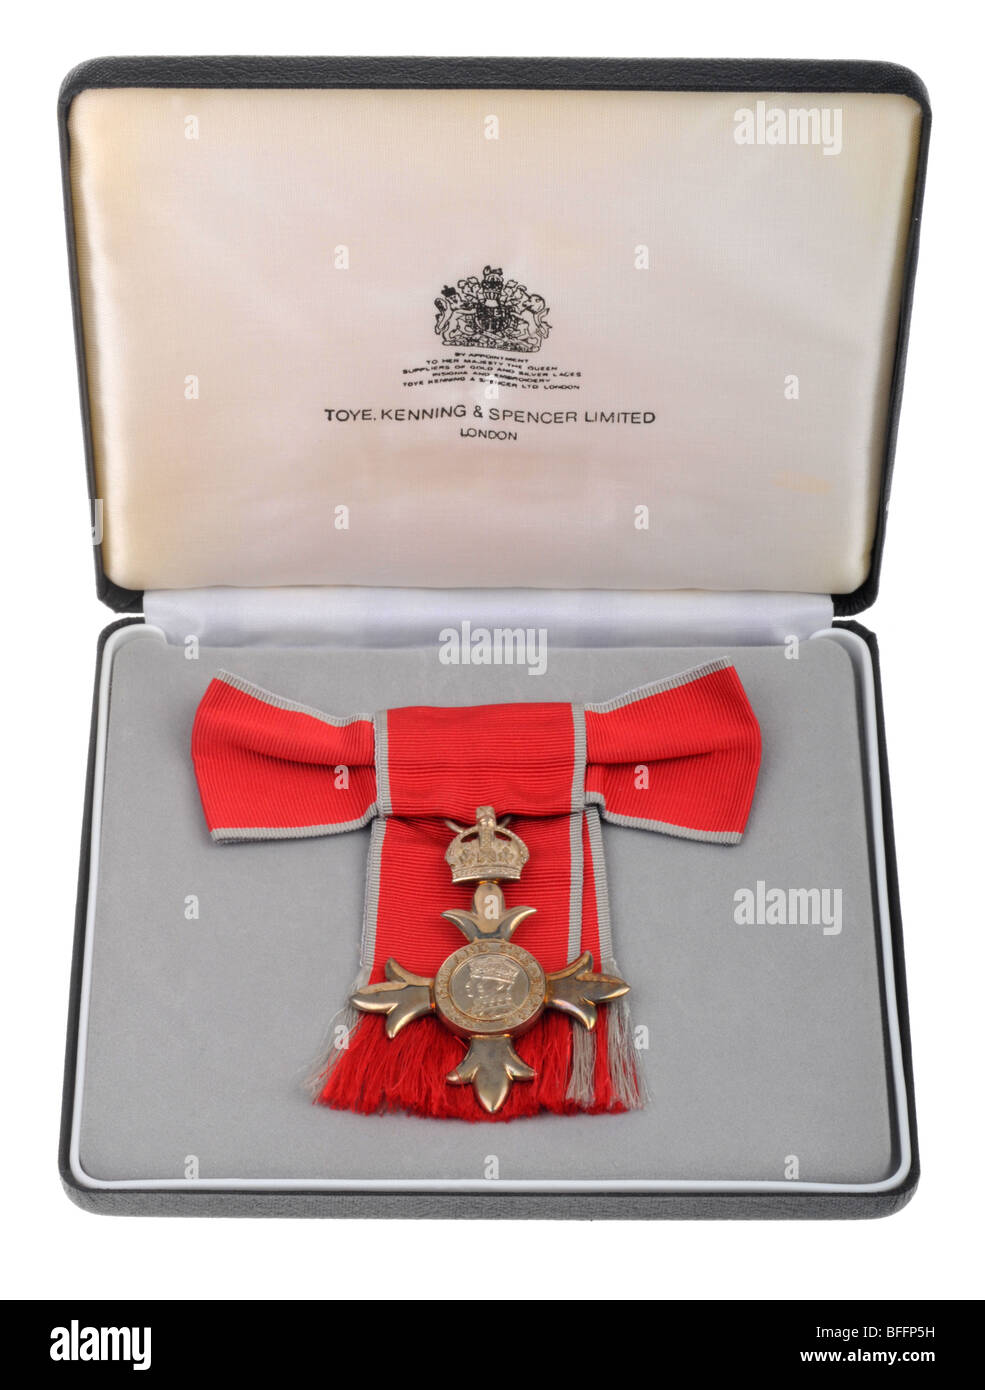 Medal Award Presentation Stock Photos & Medal Award